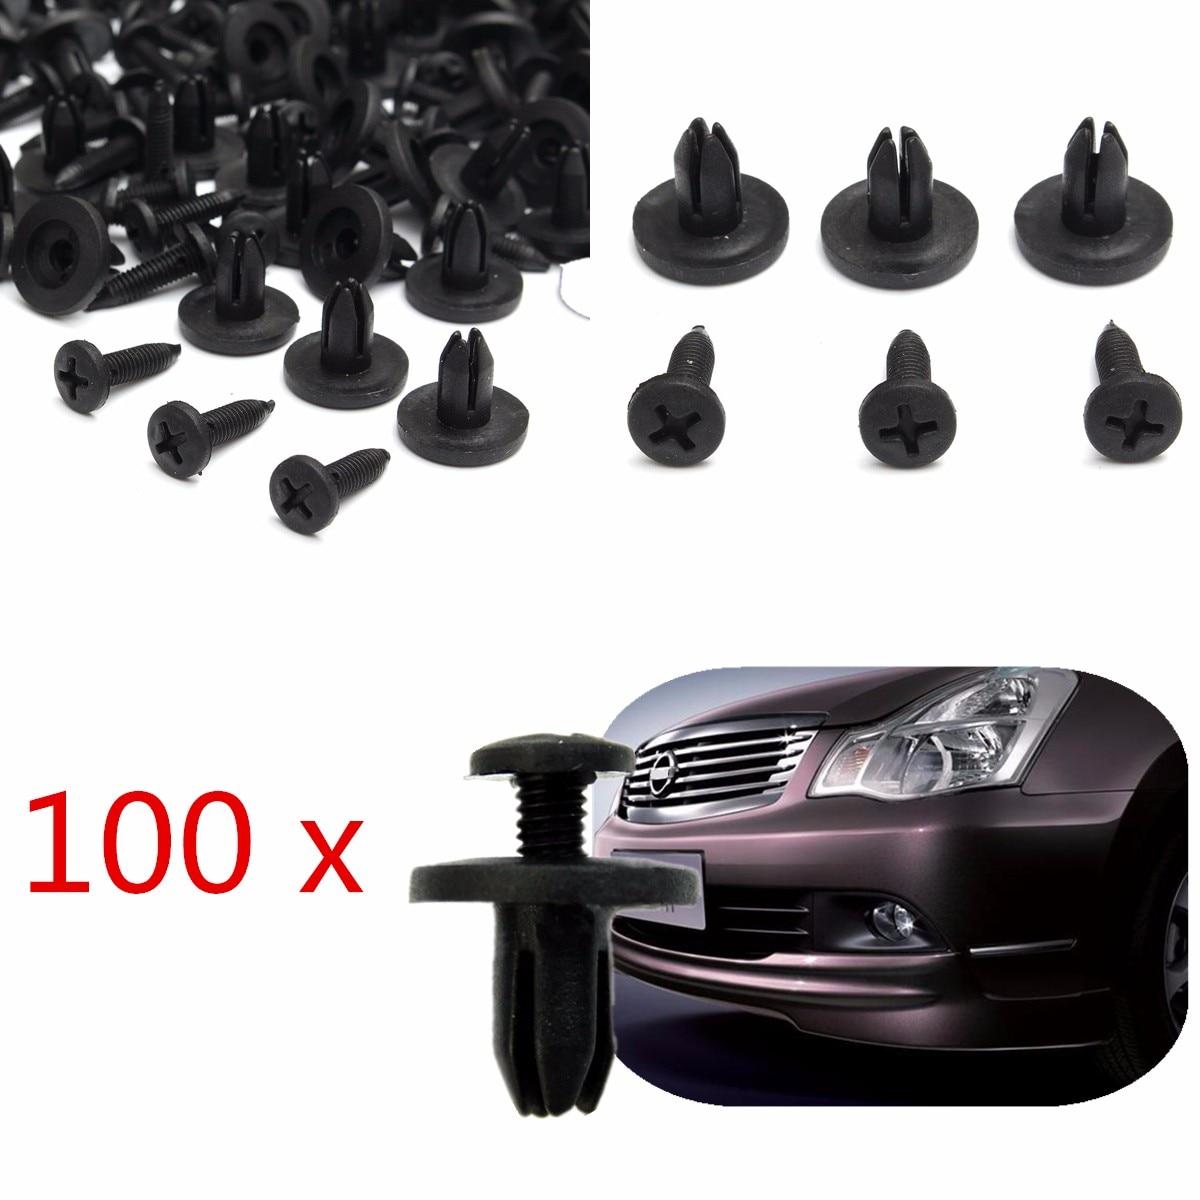 100pcs/lot Auto 6mm Hole Dia Plastic Rivets Fastener Bumper Push Pin Clips Universal